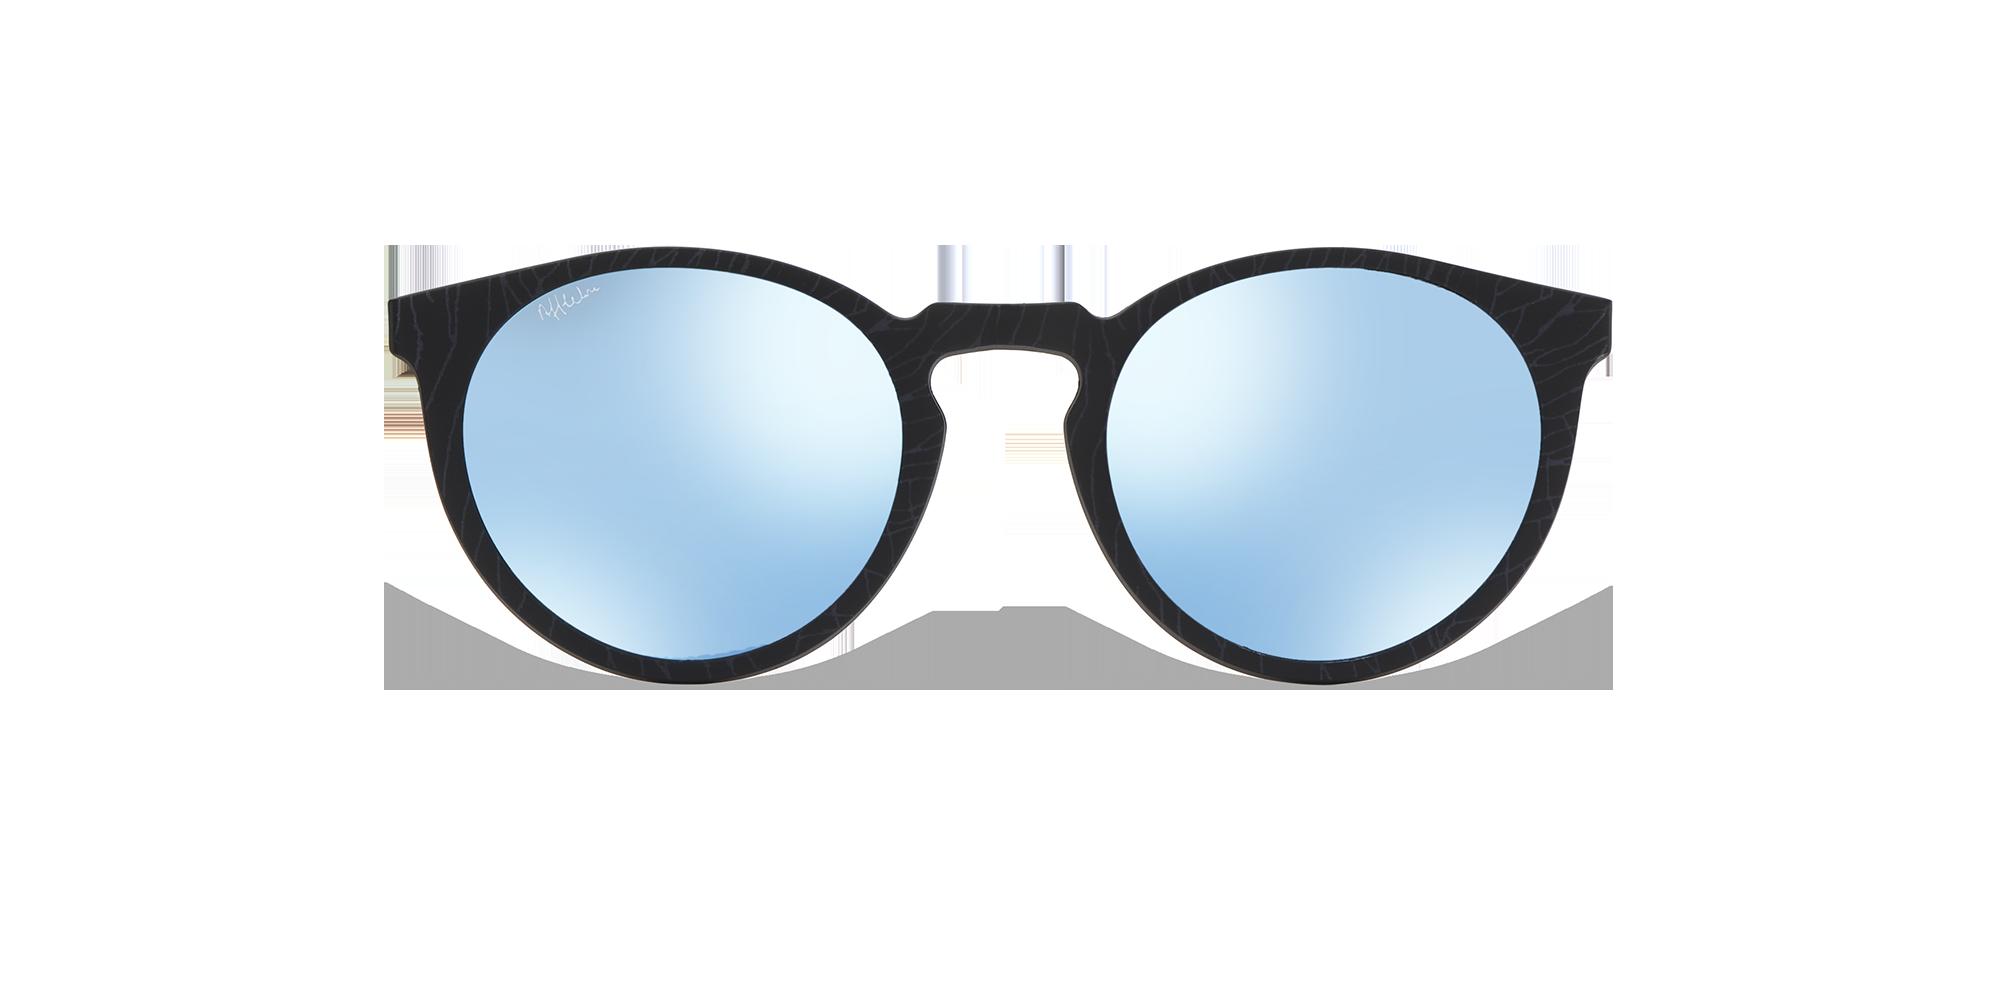 afflelou/france/products/smart_clip/clips_glasses/TMK35S4BK014820.png